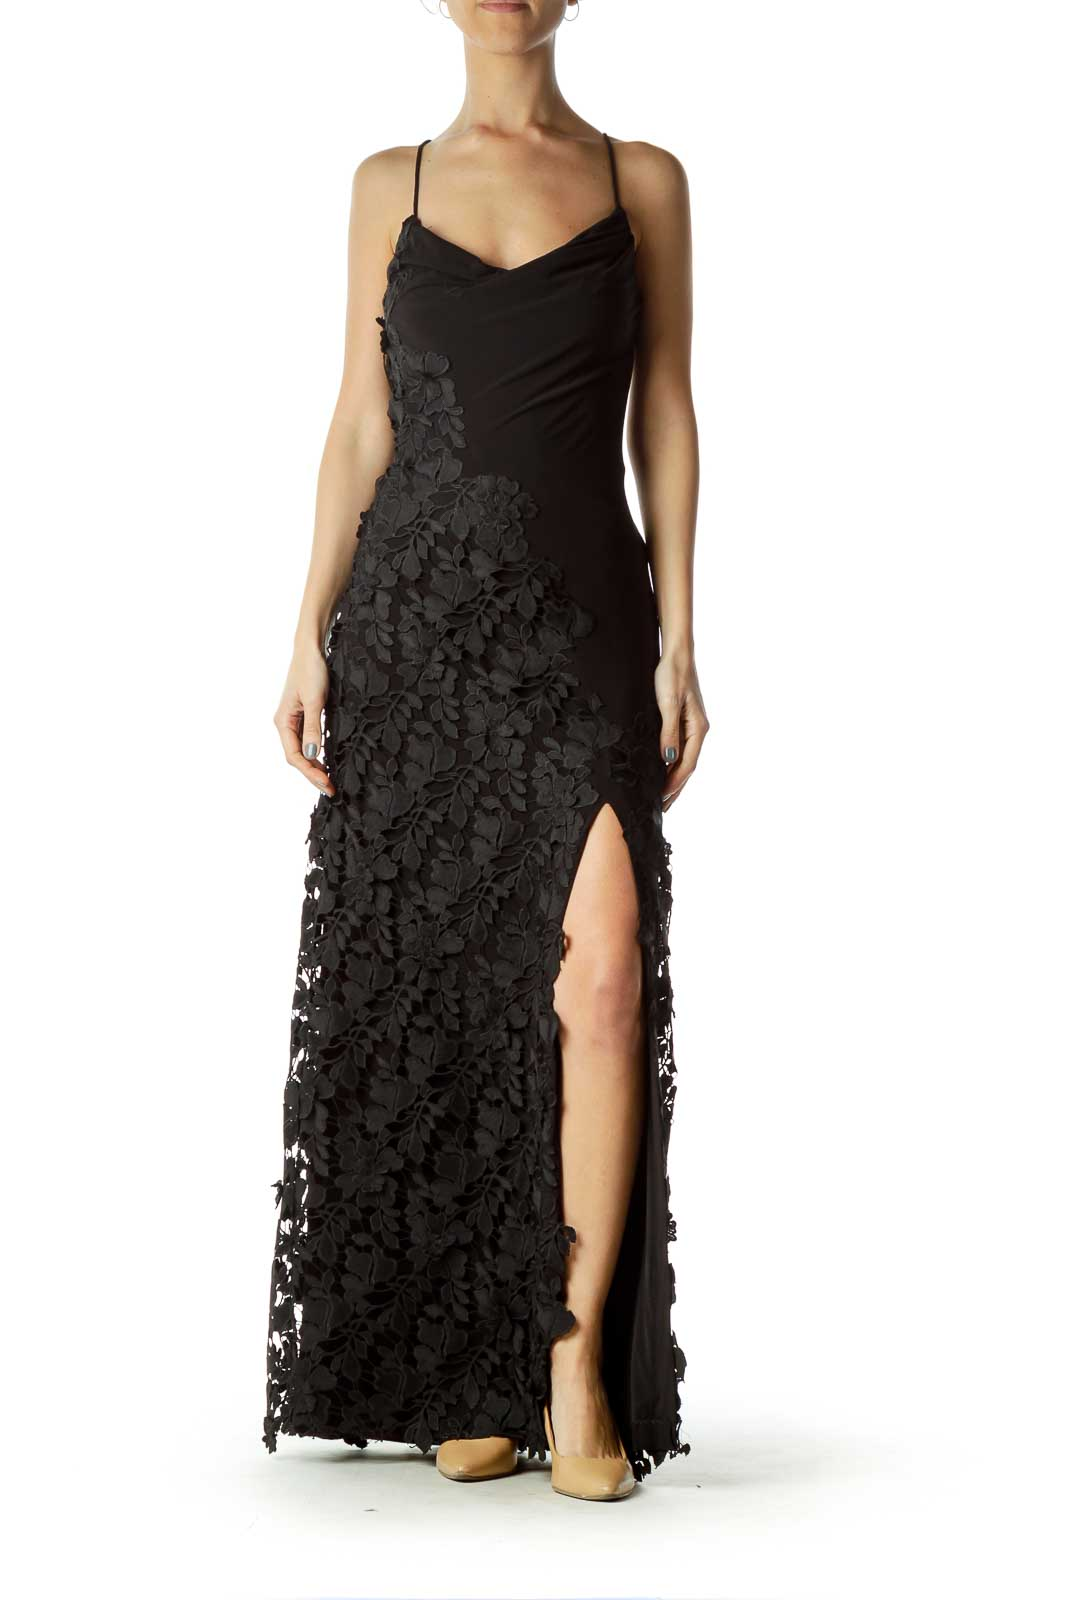 Black Crocheted Slit Evening Dress Front